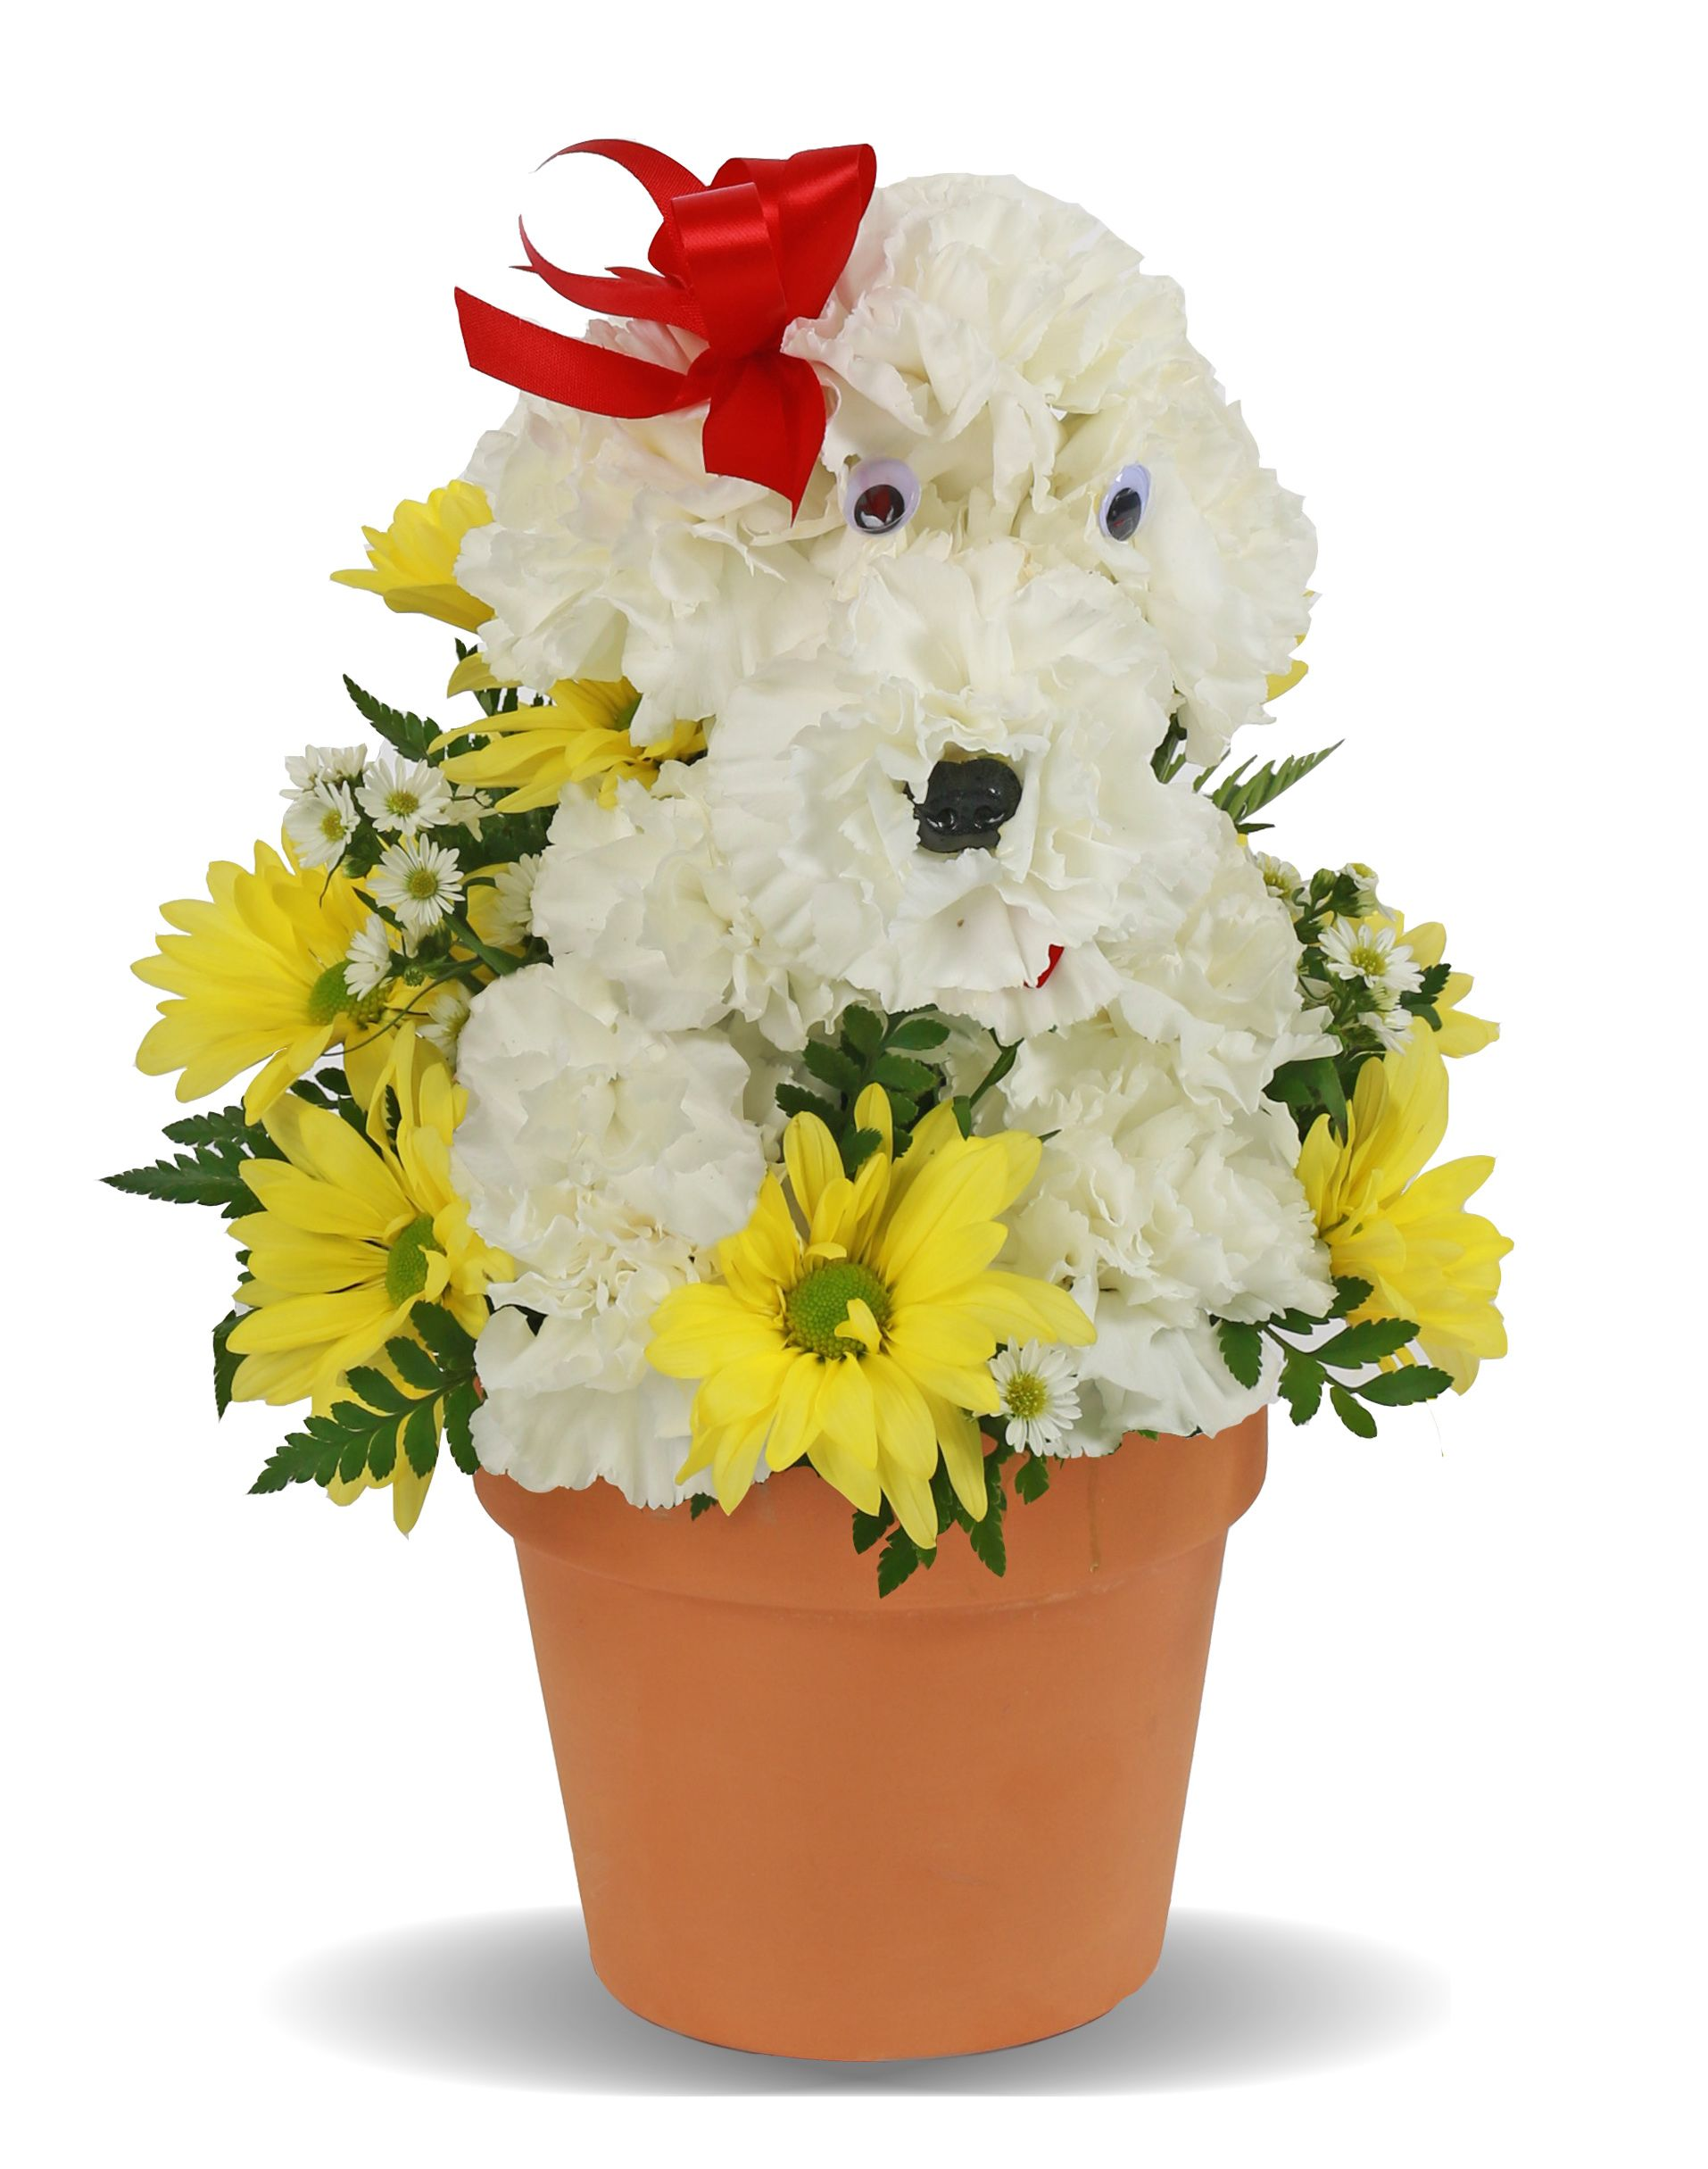 Hot Diggity Dog Birthday Flowers For Kids Columbus